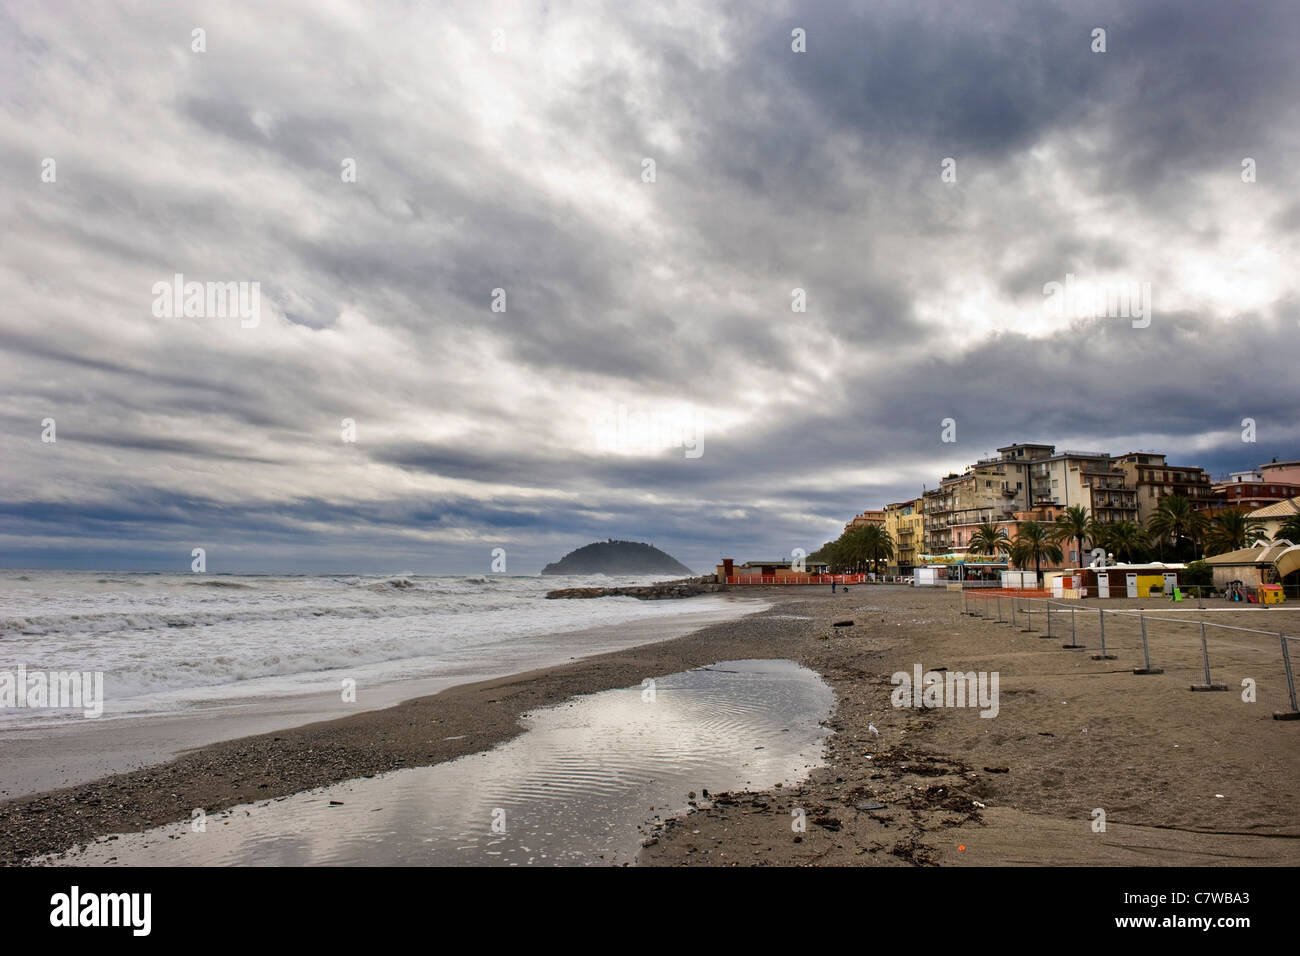 Italy, Liguria, Albenga, the beach - Stock Image